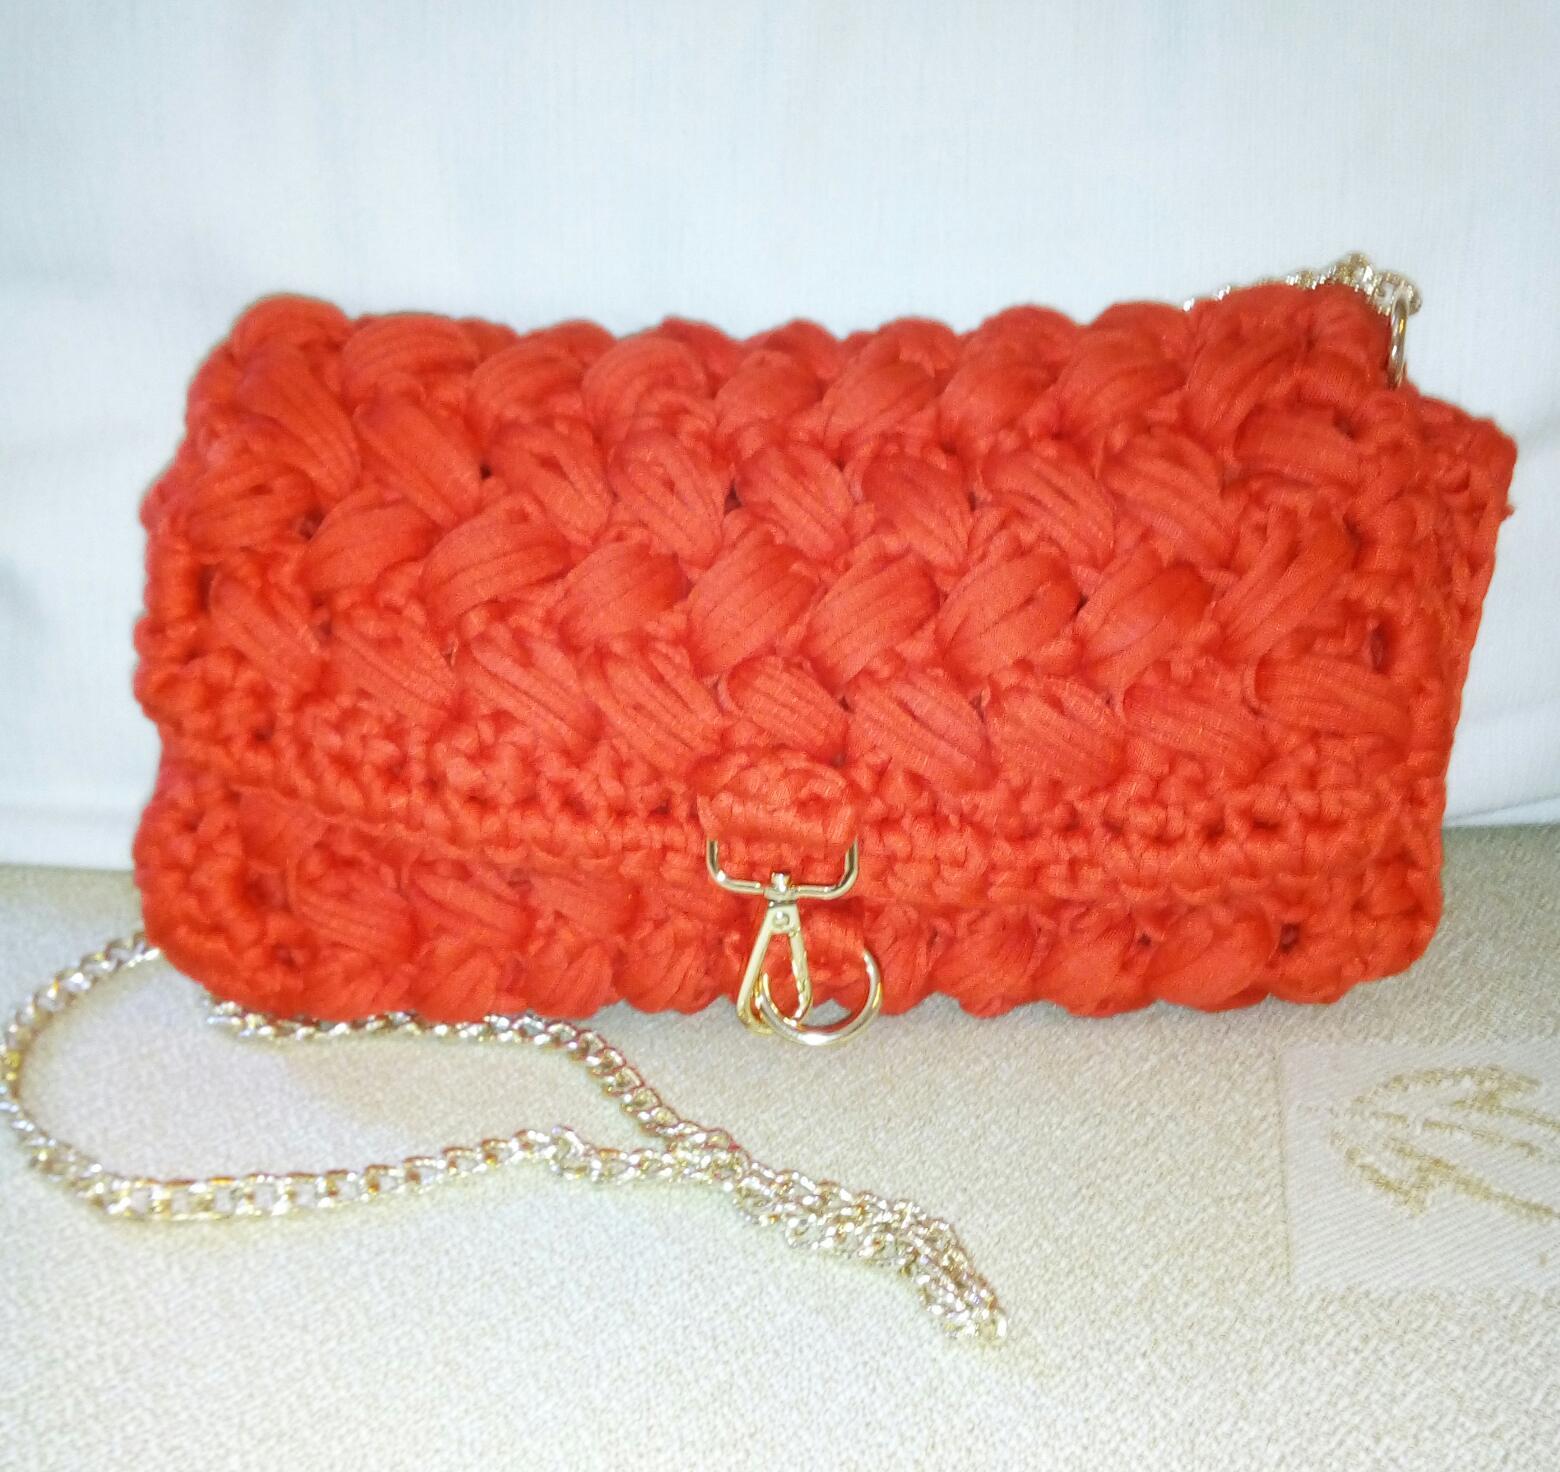 99d6a7e50d Γυναικείο τσαντάκι με ζωηρό καλοκαιρινό χρώμα για τα καλοκαιρινά  βράδια💖💖💖